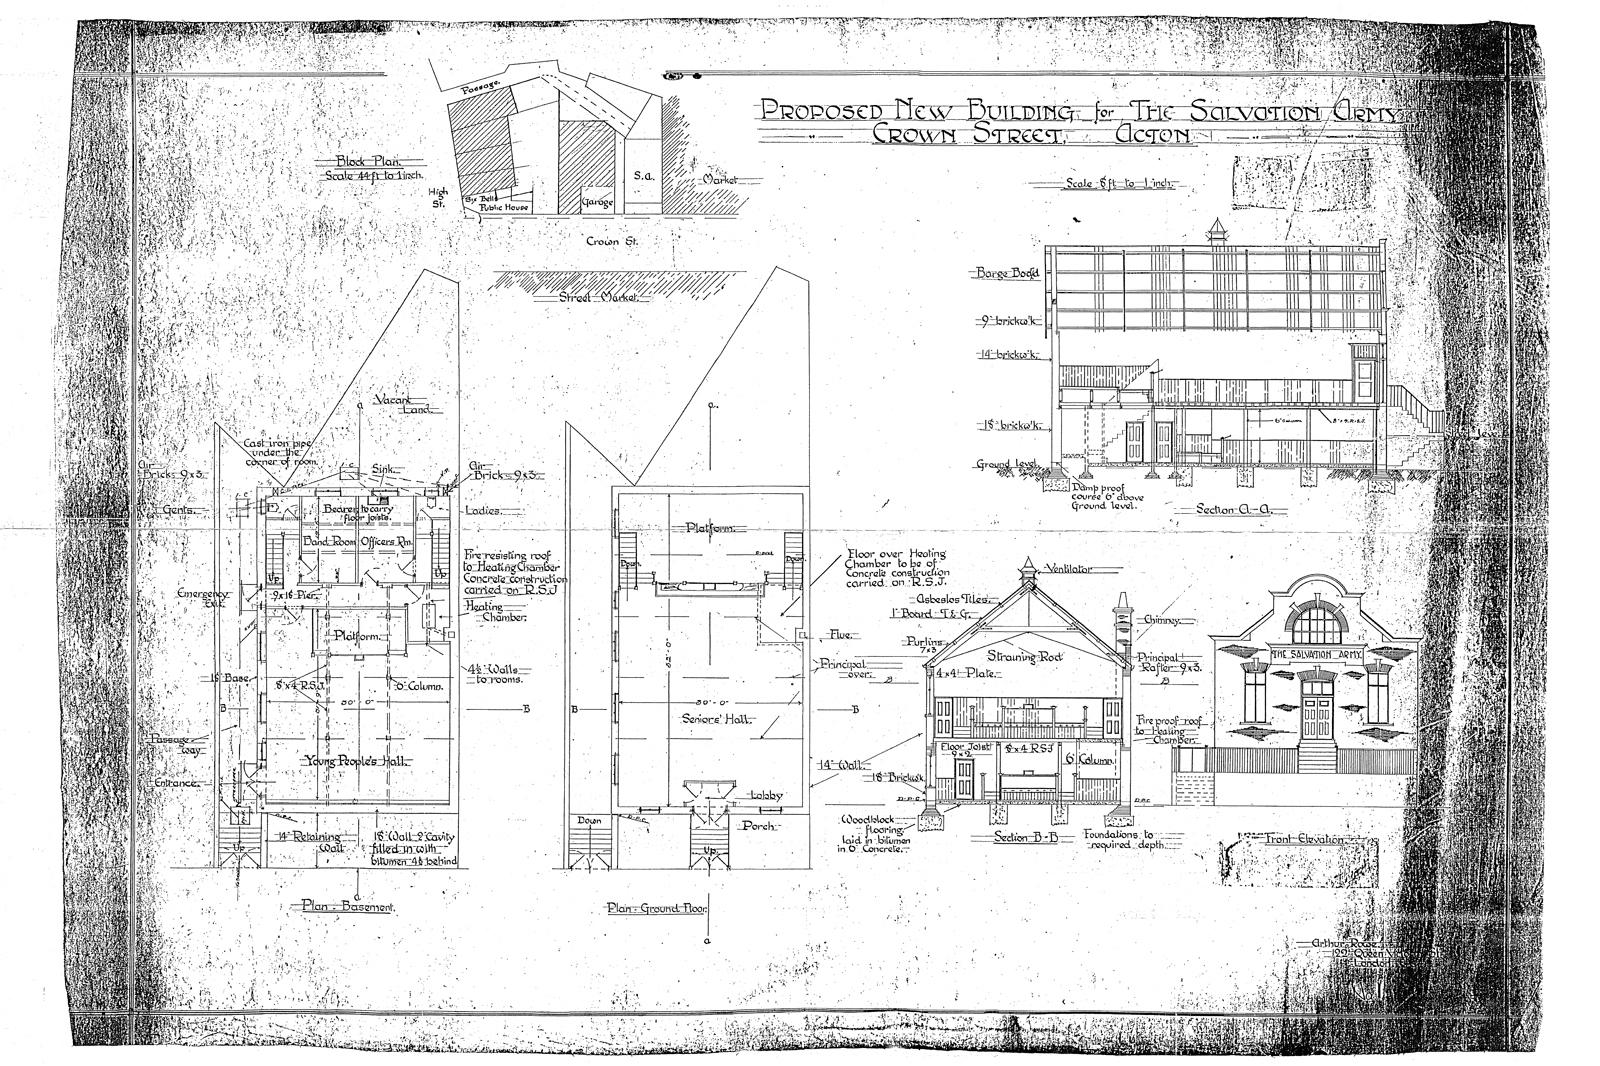 historic draiwng of Salvation Army Acton